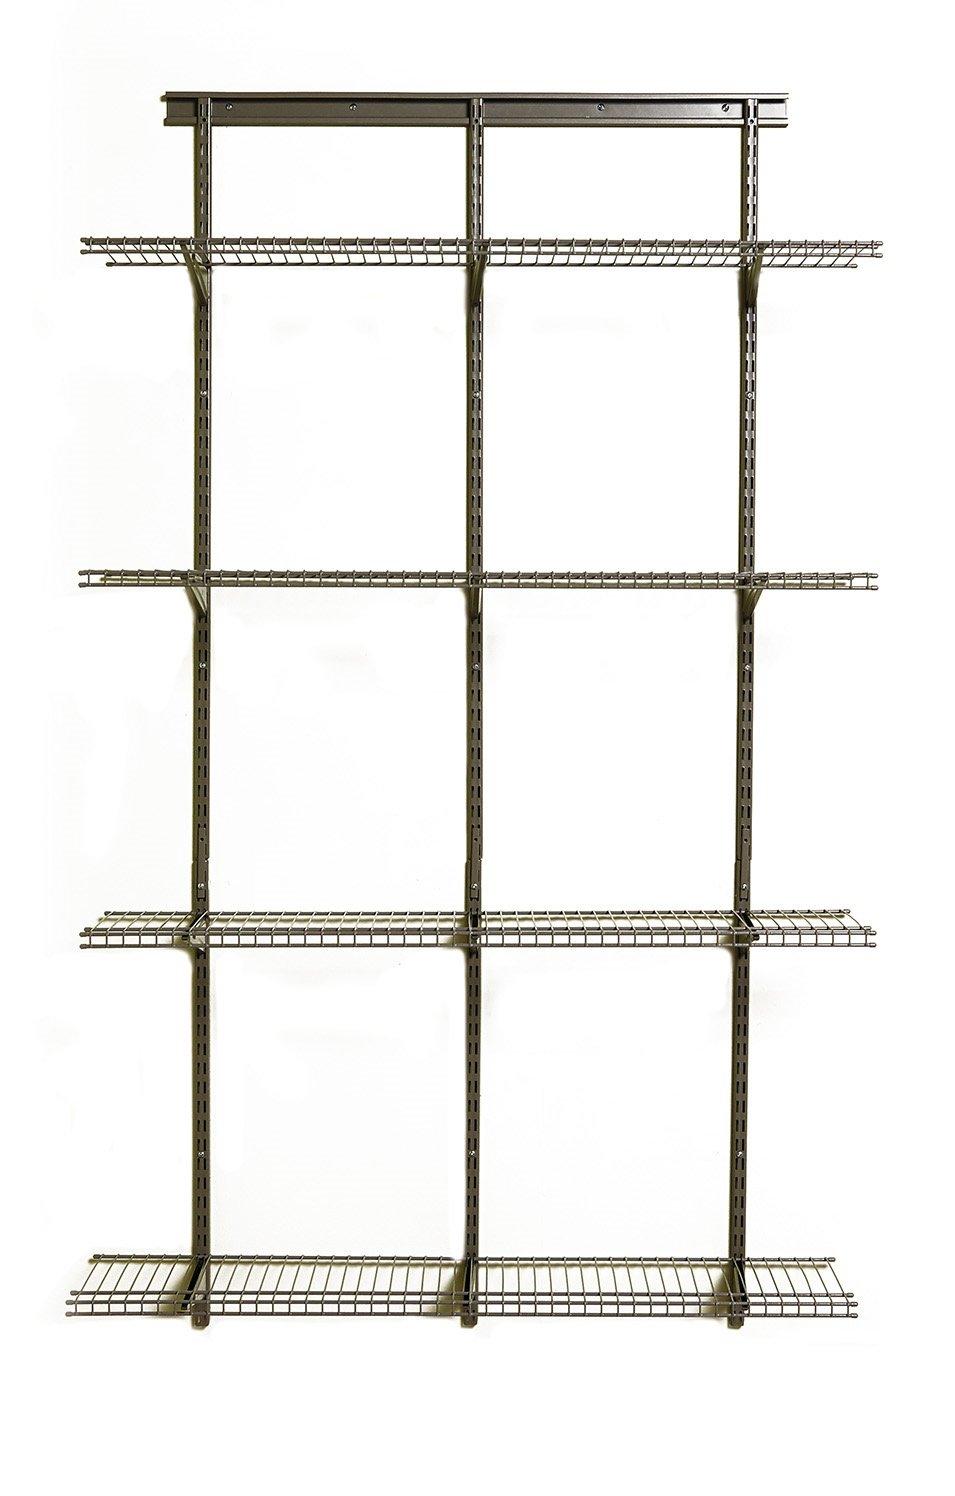 ClosetMaid 52845 ShelfTrack Adjustable Utility Organizer Kit,Nickel,4'. X 12 in 4'. X 12 in